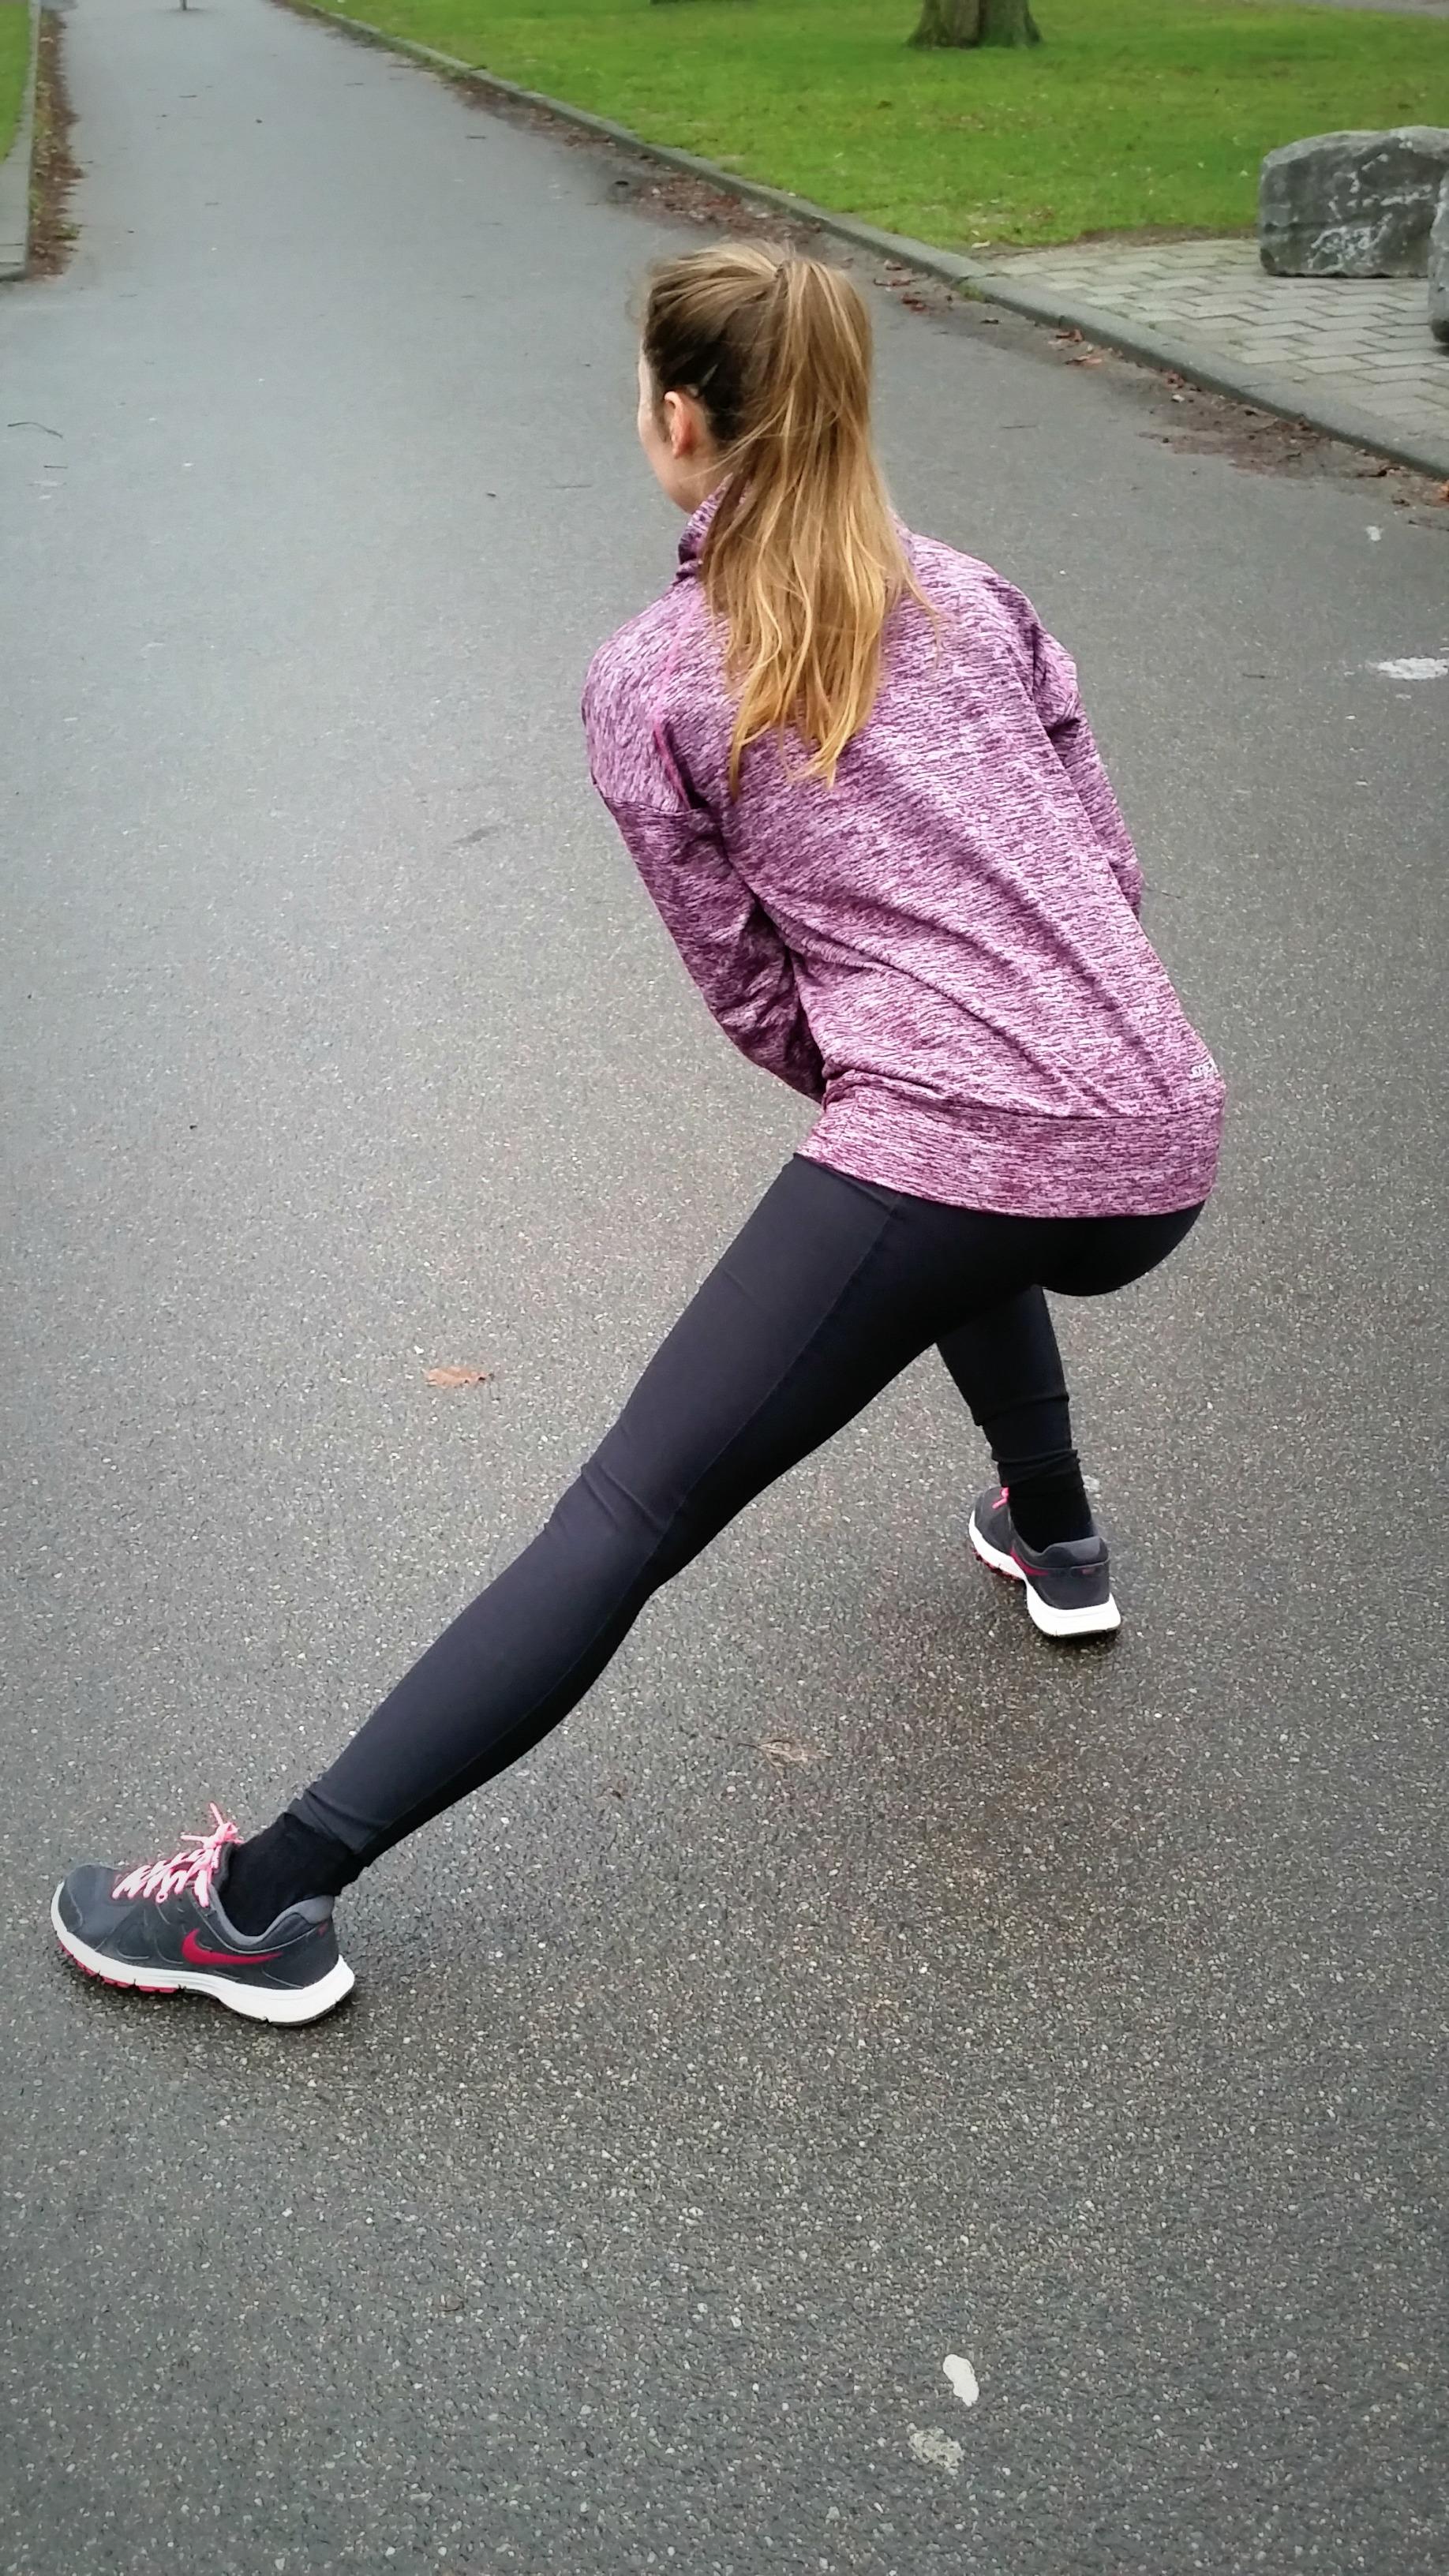 Hardlopen doe je ook in de winter!